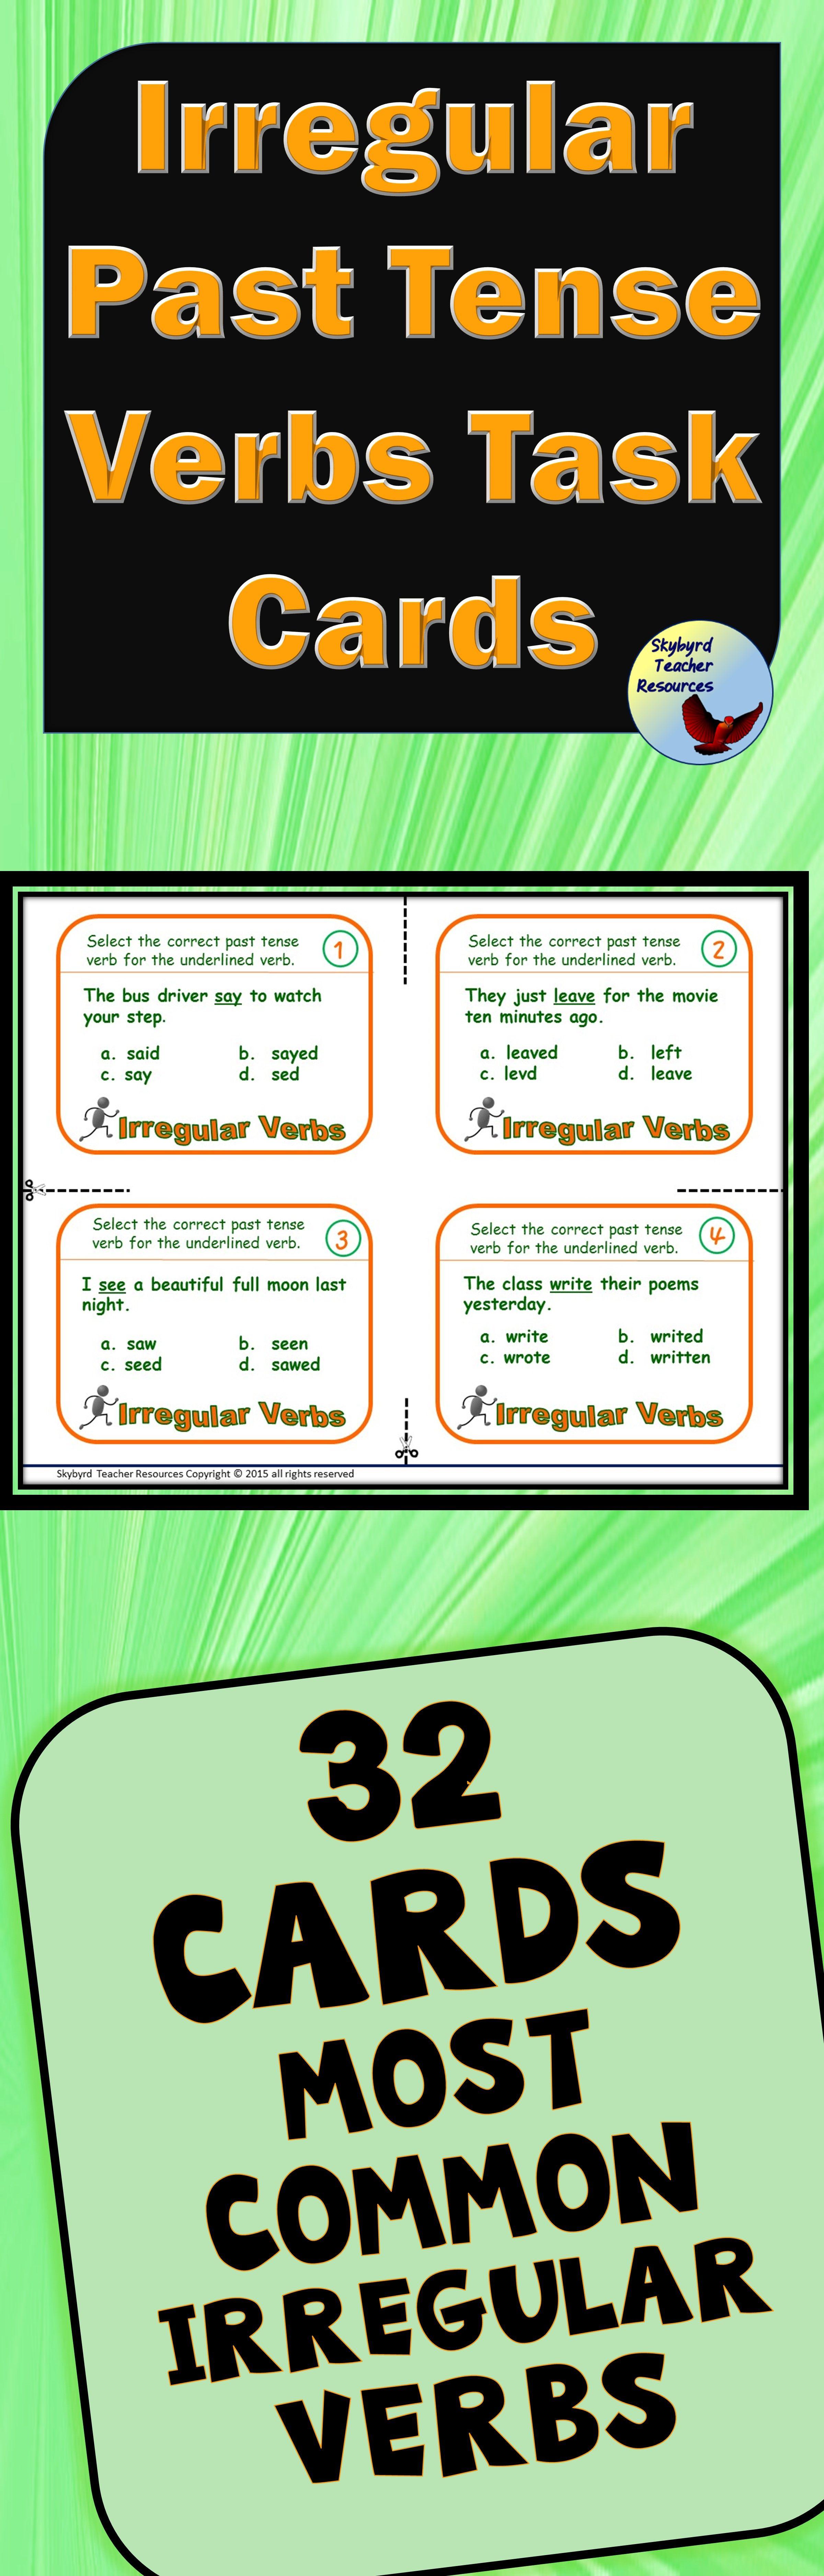 Vocabulary Task Cards Irregular Past Tense Verbs Task Card Set Ela Esl Irregular Past Tense Verbs Irregular Past Tense Vocabulary Task Cards [ 7500 x 2400 Pixel ]